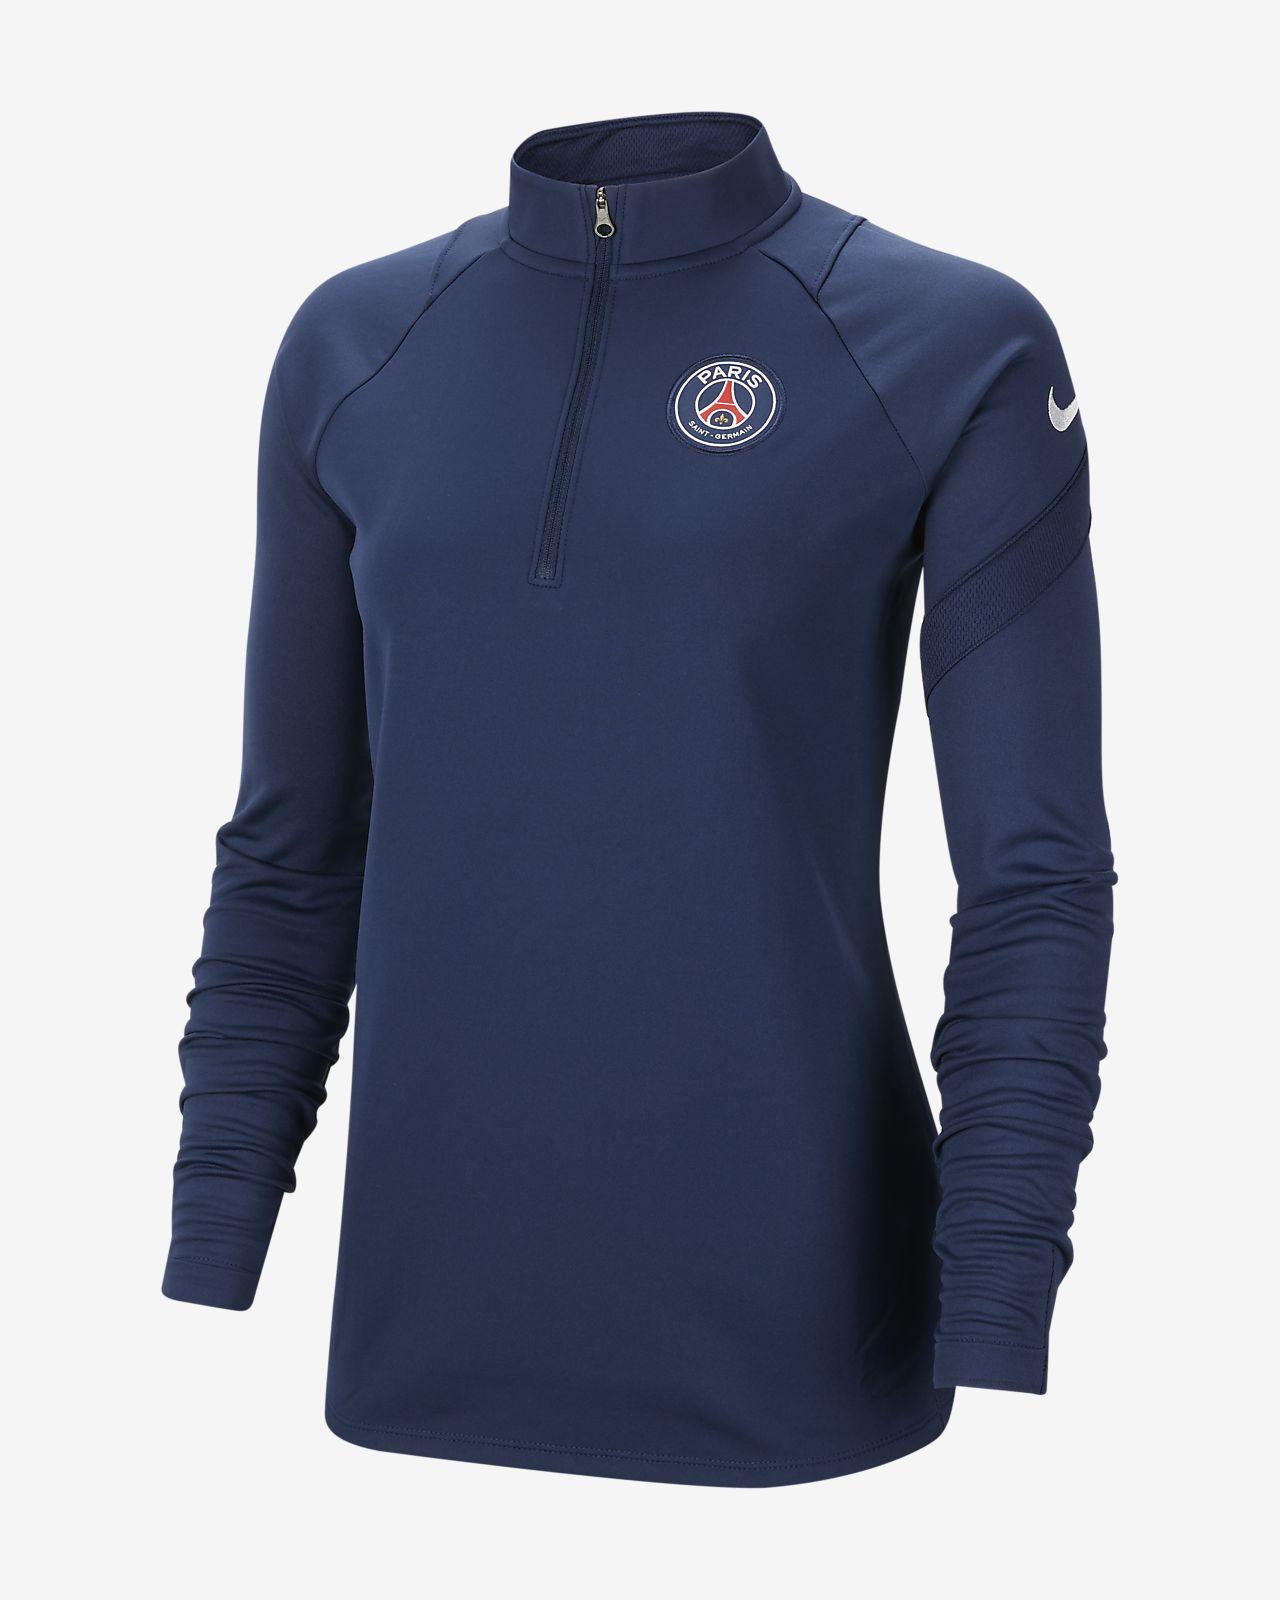 Paris Saint-Germain Academy Pro Women's Football Drill Top